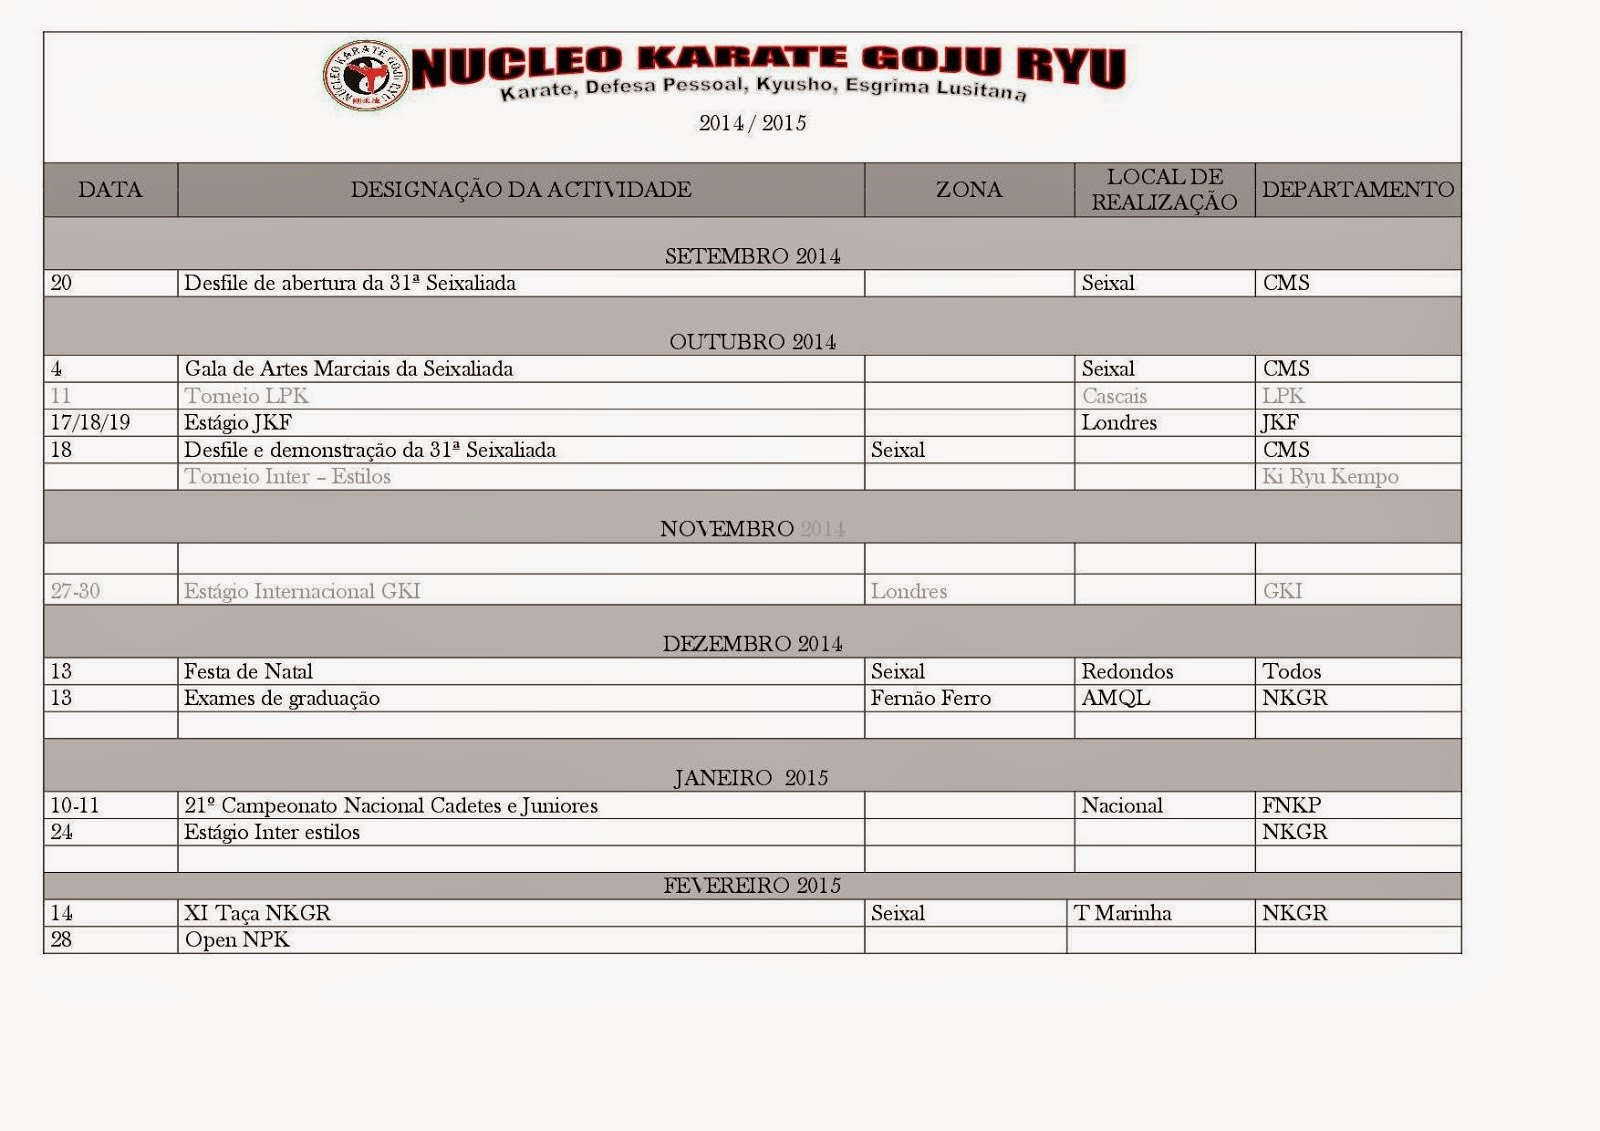 Calendario NKGR  2014 - 2015